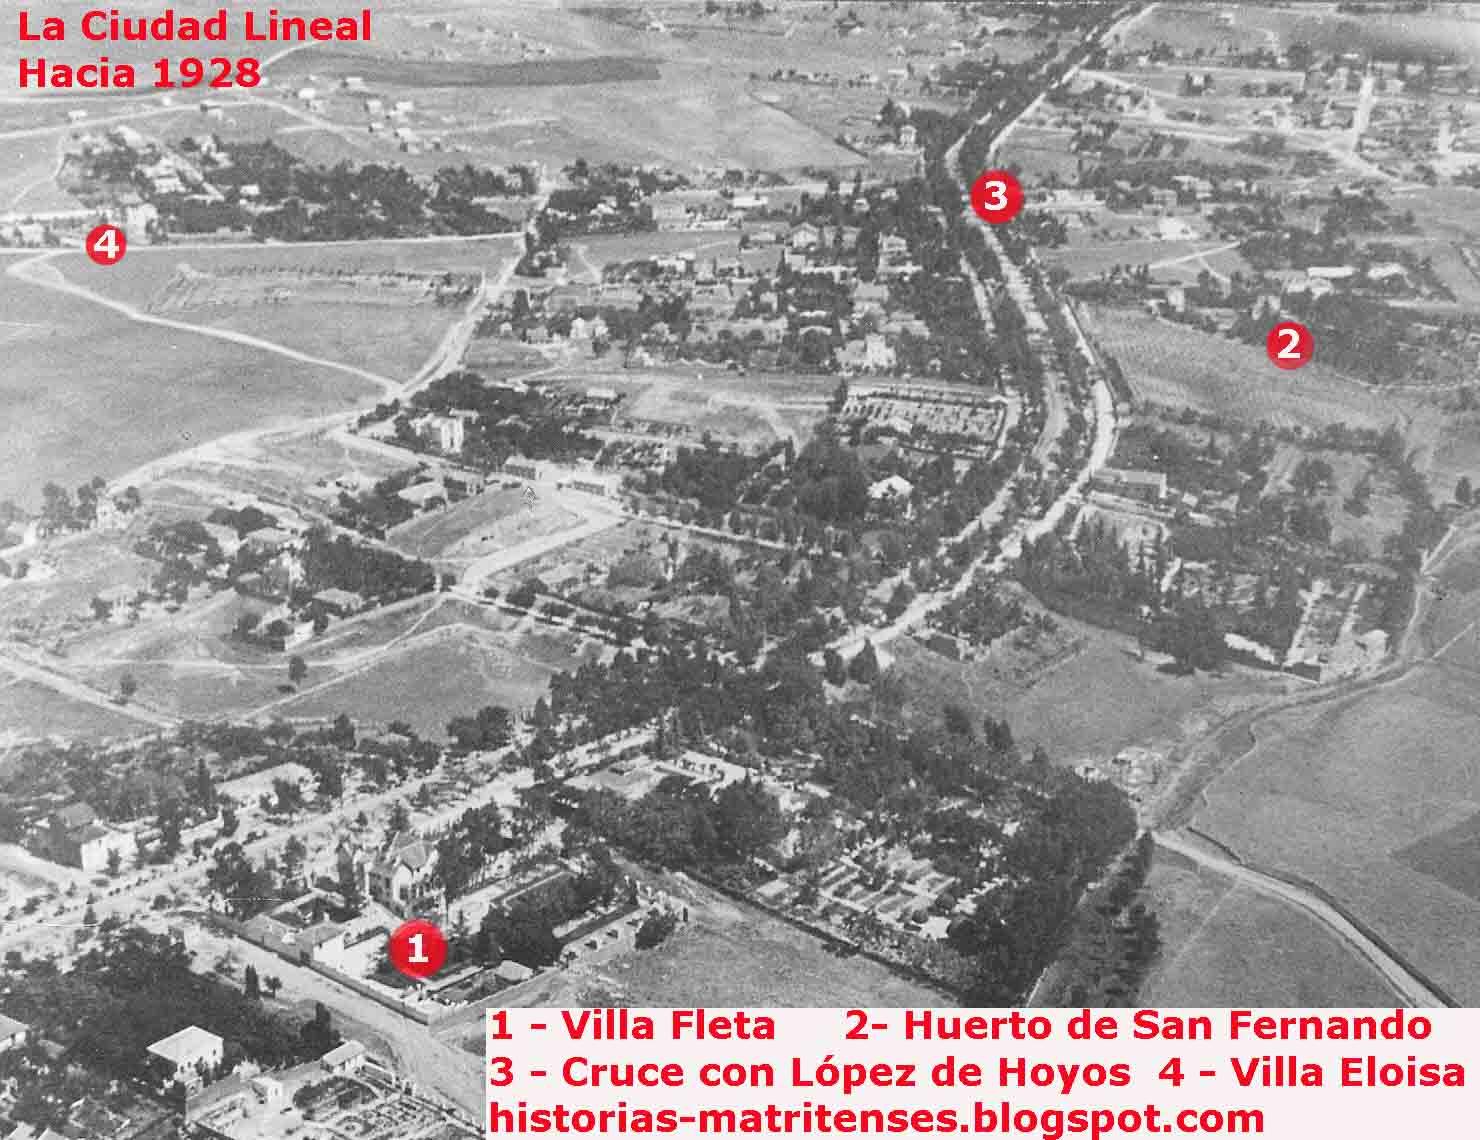 Historias matritenses La Ciudad Lineal durante la Guerra Civil